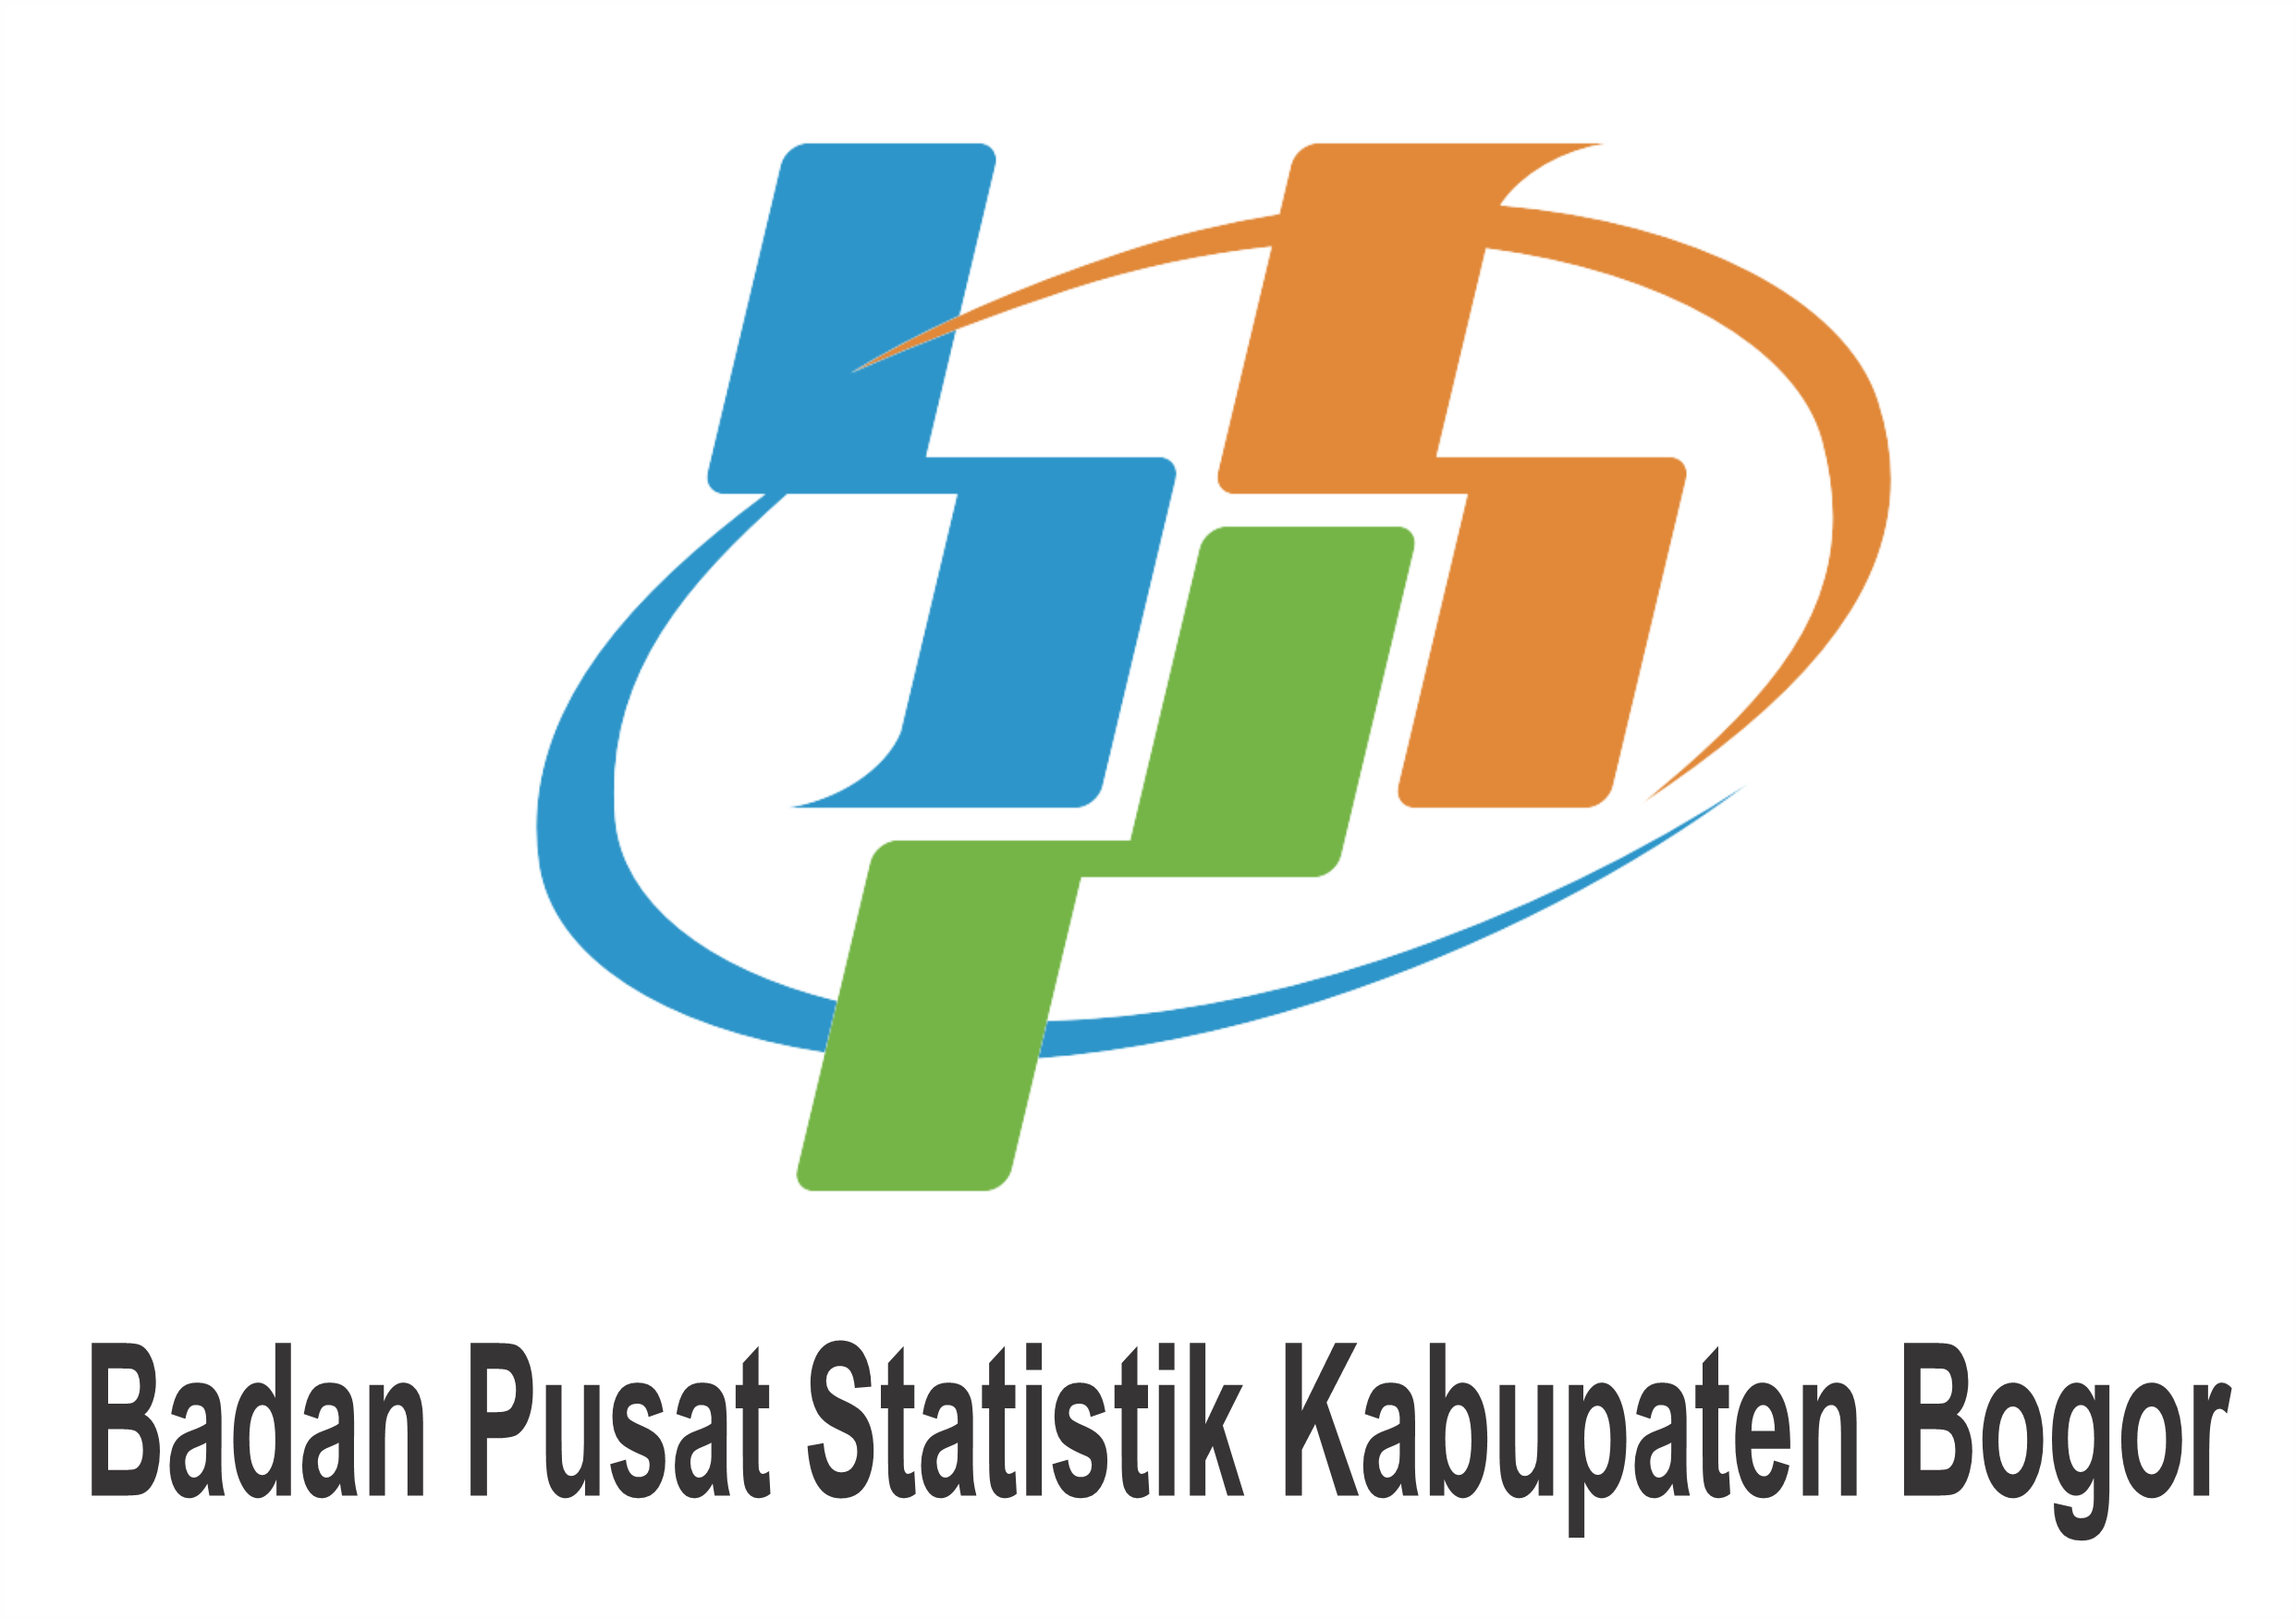 Badan Pusat Statistik Kabupaten Bogor